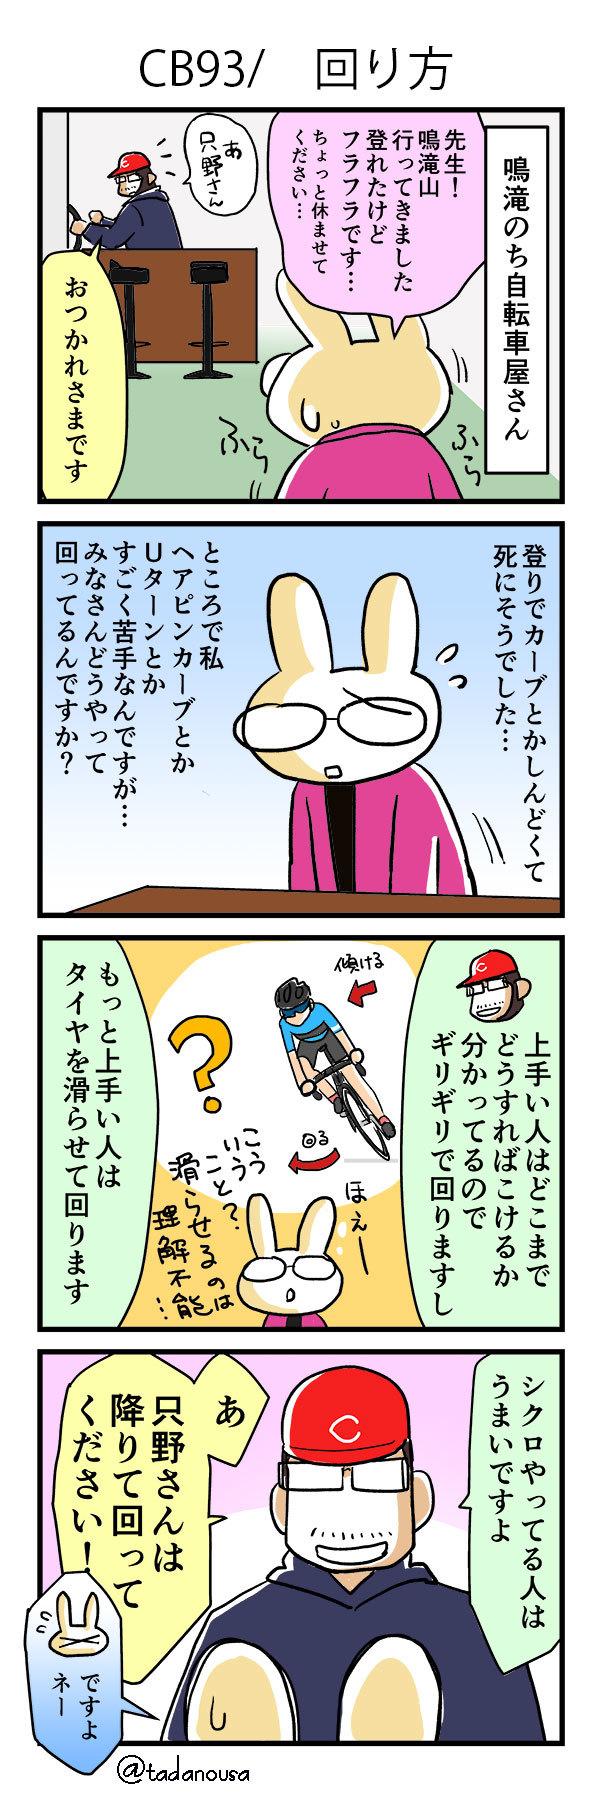 bike_4koma_kako133_s.jpg